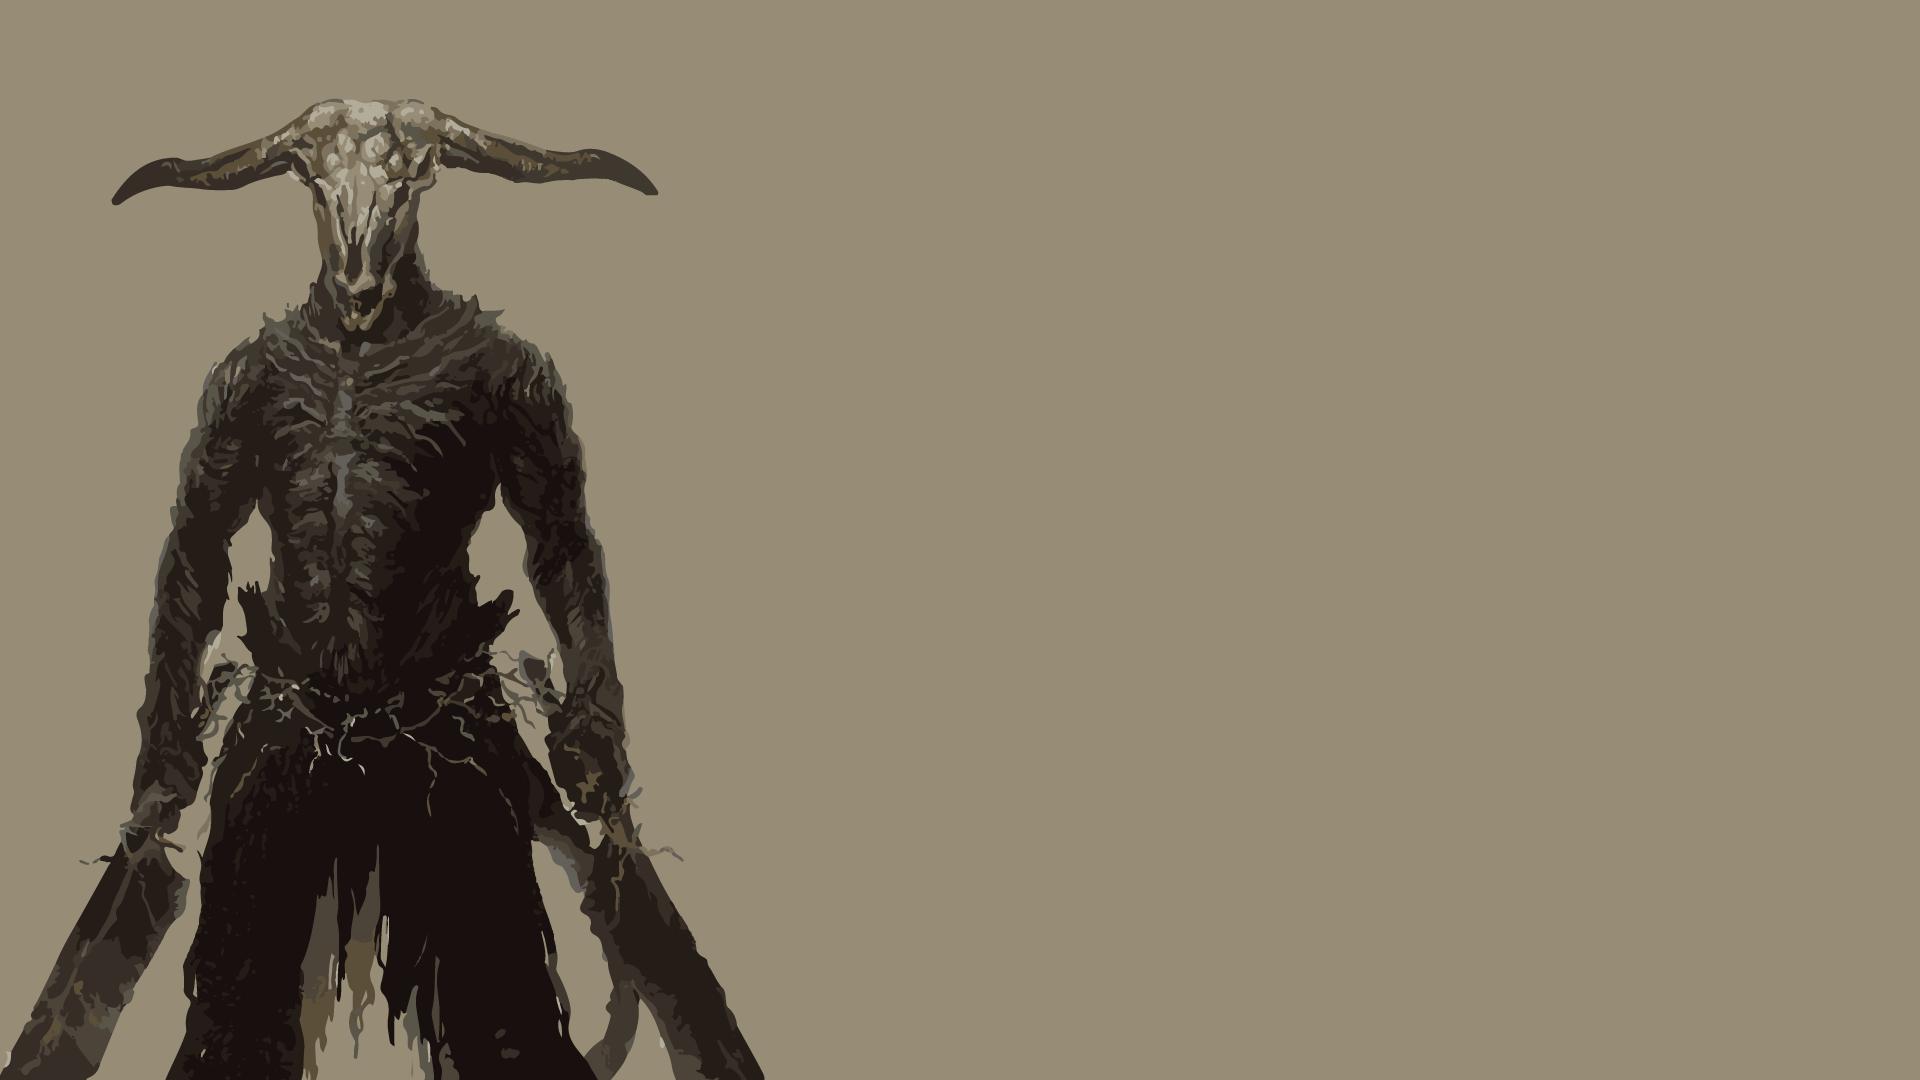 Dark Souls Hd Png Transparent Dark Souls Hdpng Images